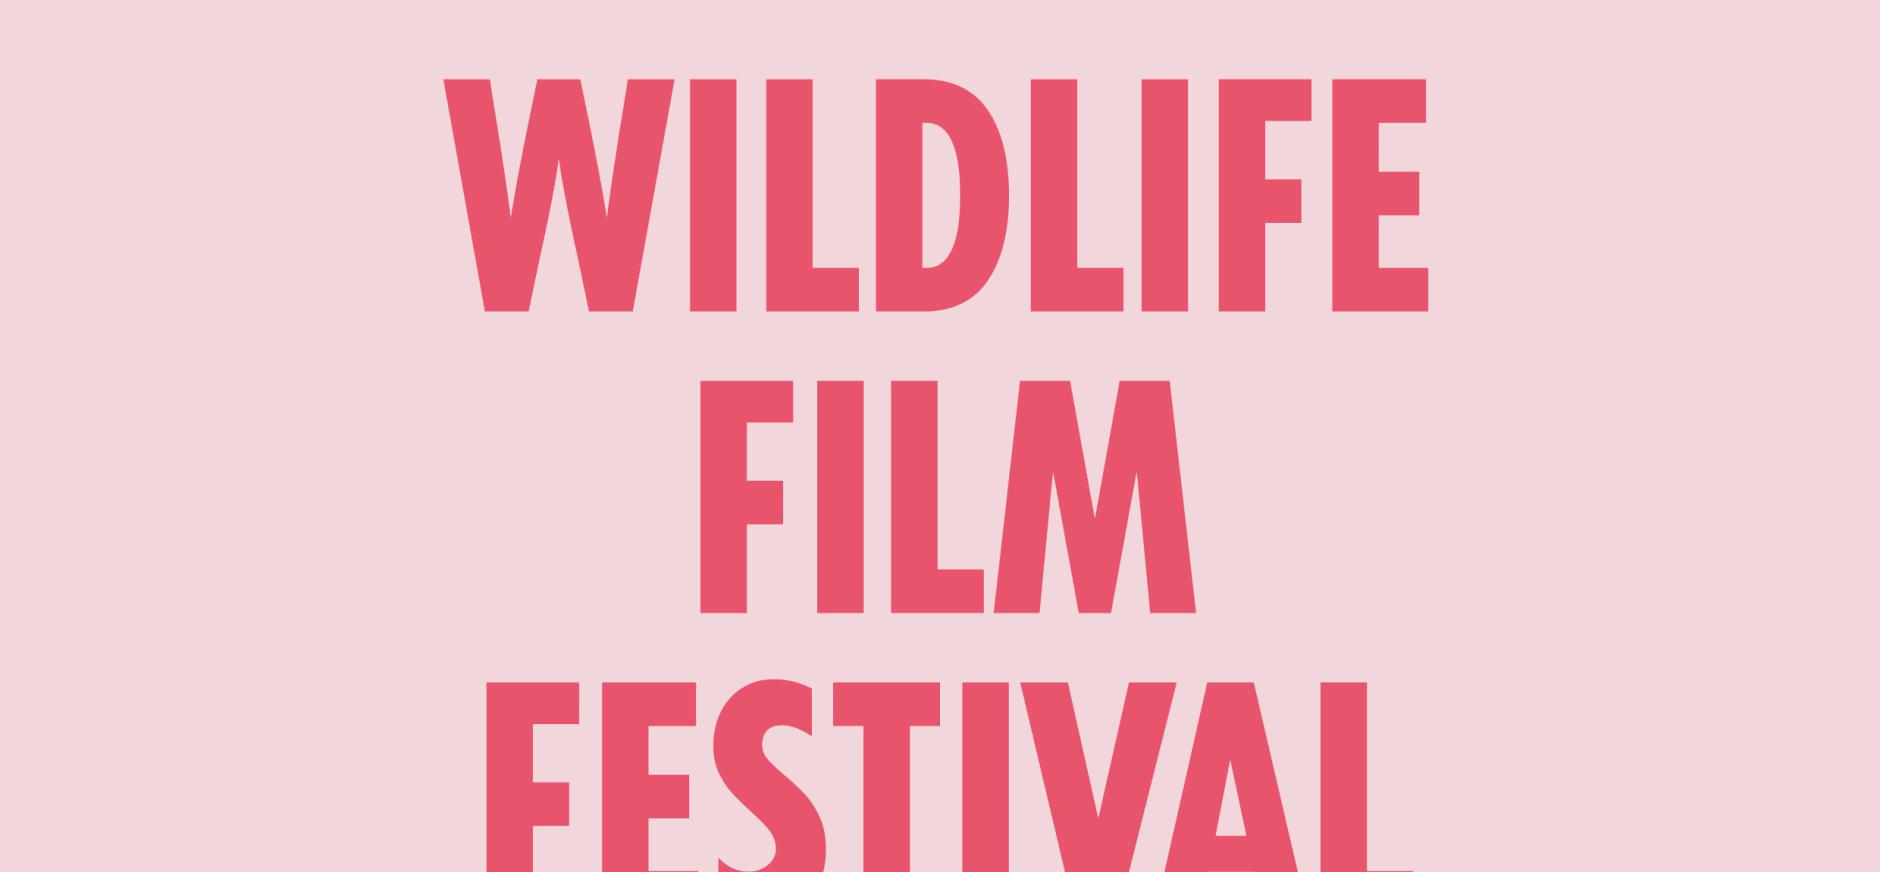 De mooiste natuurfilms tijdens Wildlife Film Festival Rotterdam 2017